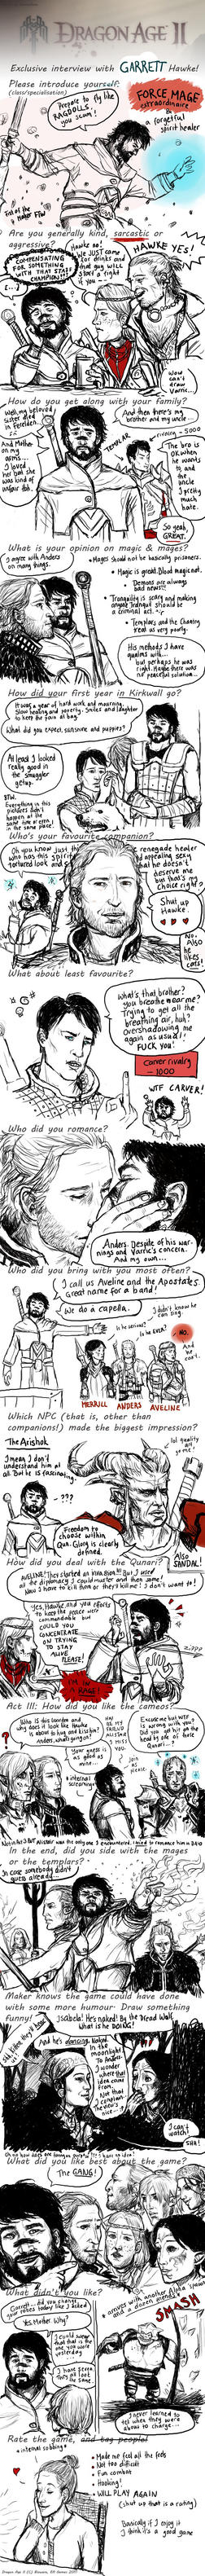 The Massive Dragon Age 2 Meme (SPOILERS) by IdaHarra